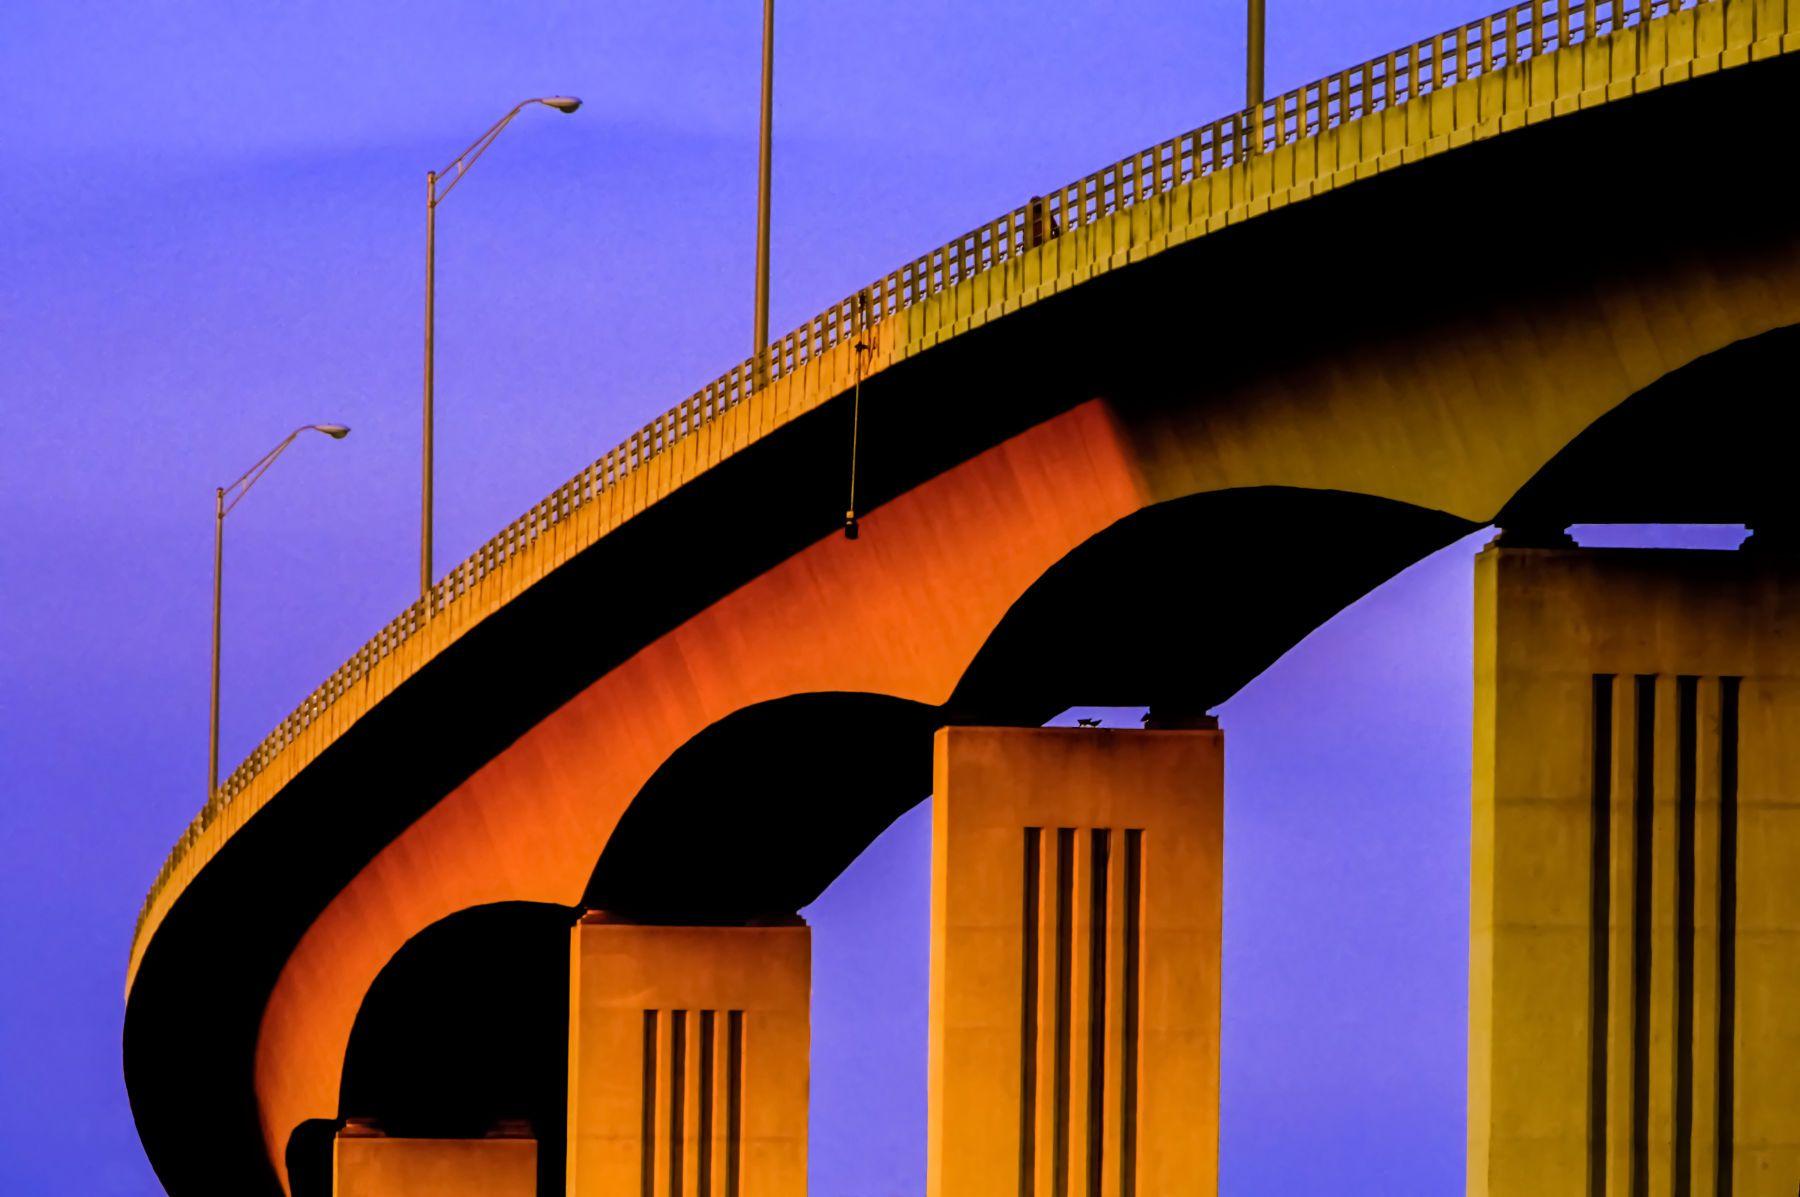 Seabreeze Bridge #3